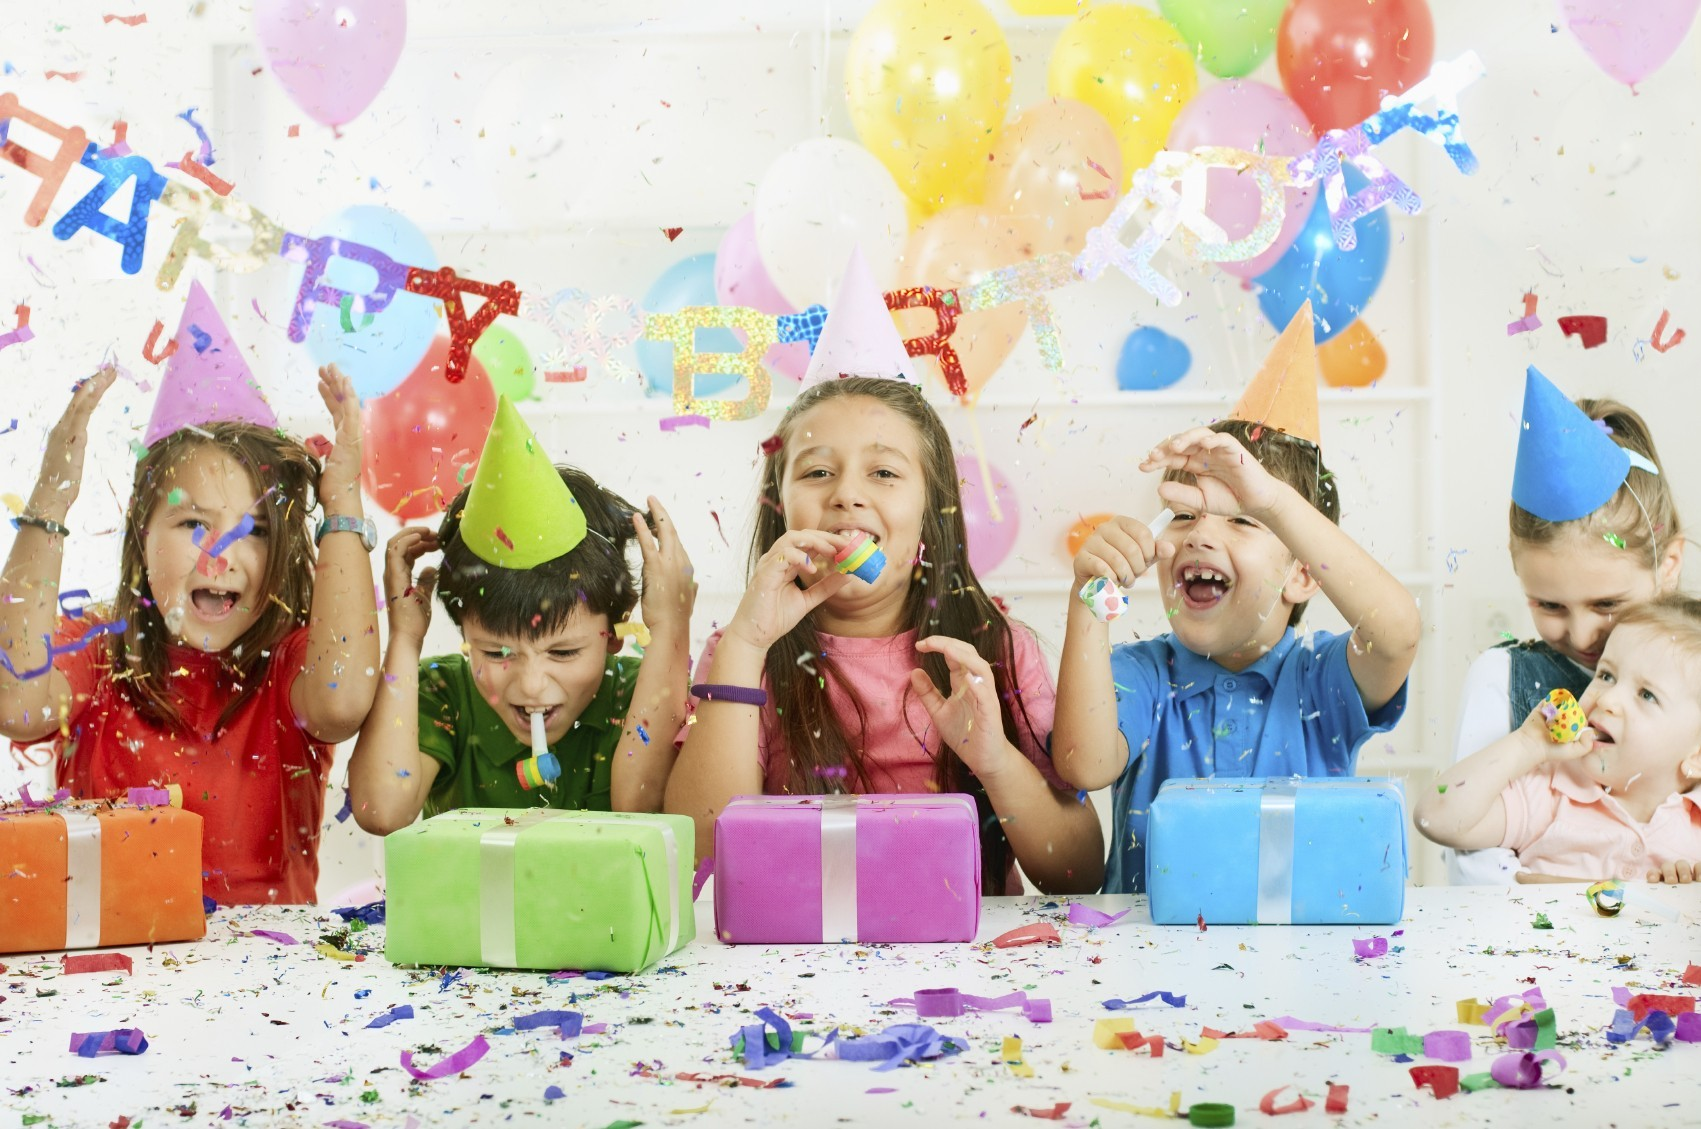 geburtstagsideen kindergeburtstagsparty organisieren geburtstag feiern